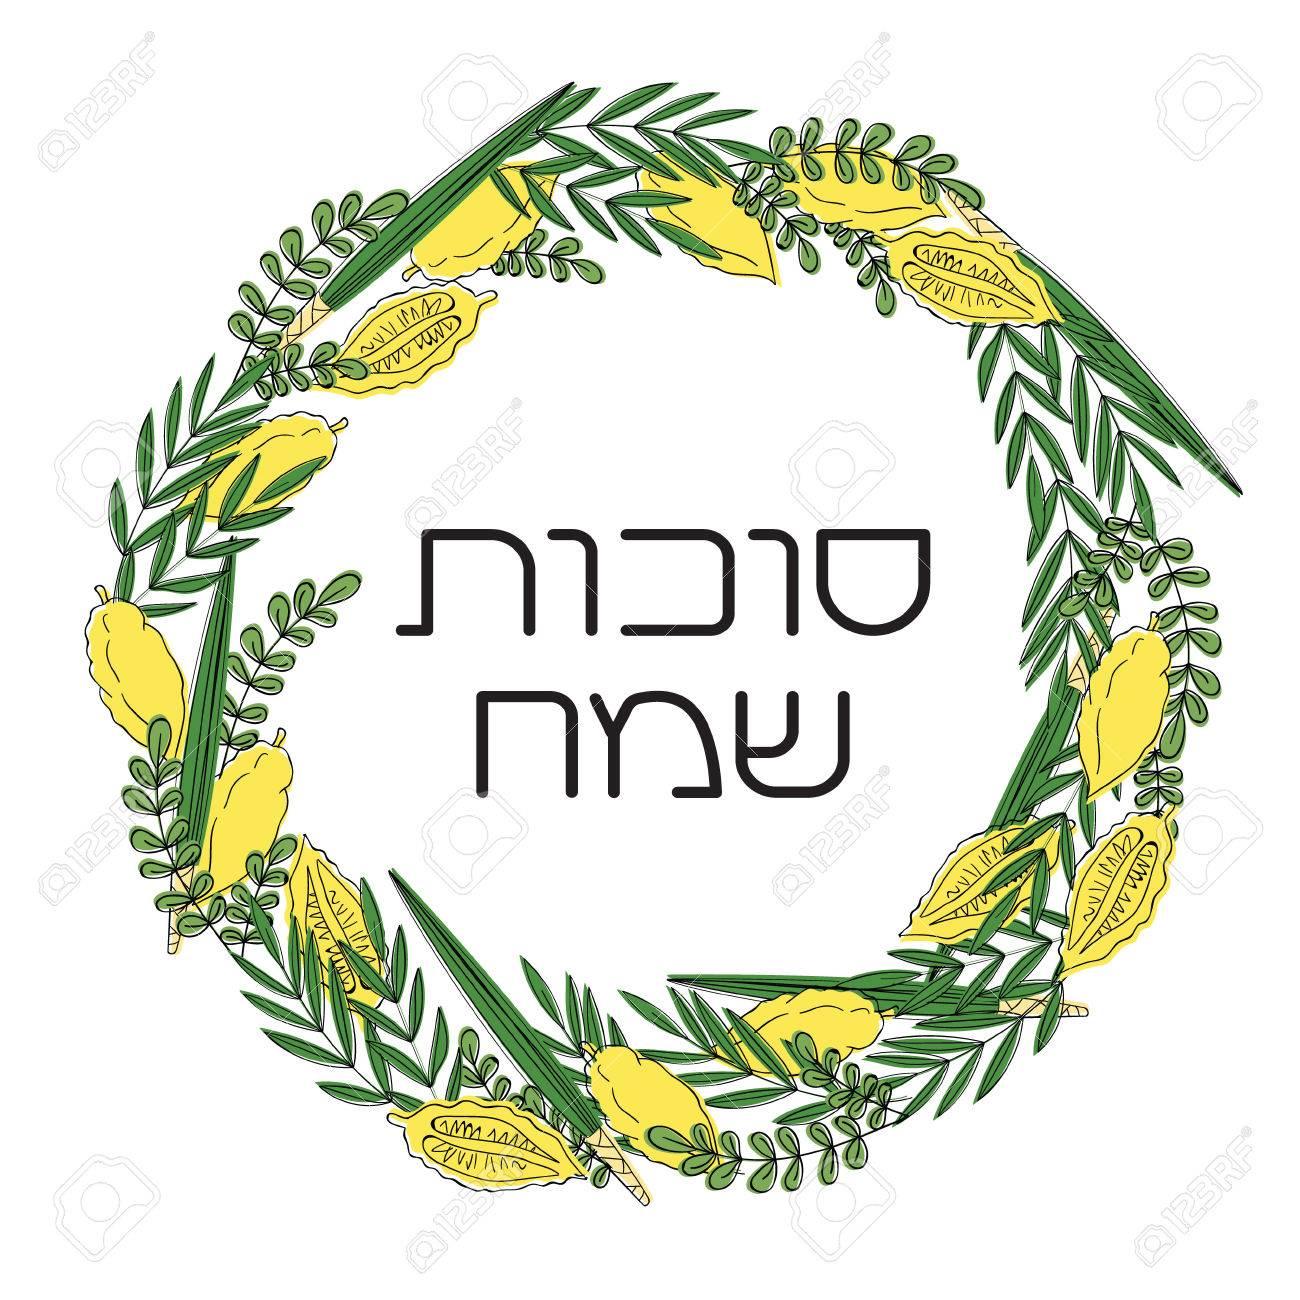 Sukkot Jewish Holiday Greeting Card Frame With Holiday Symbols